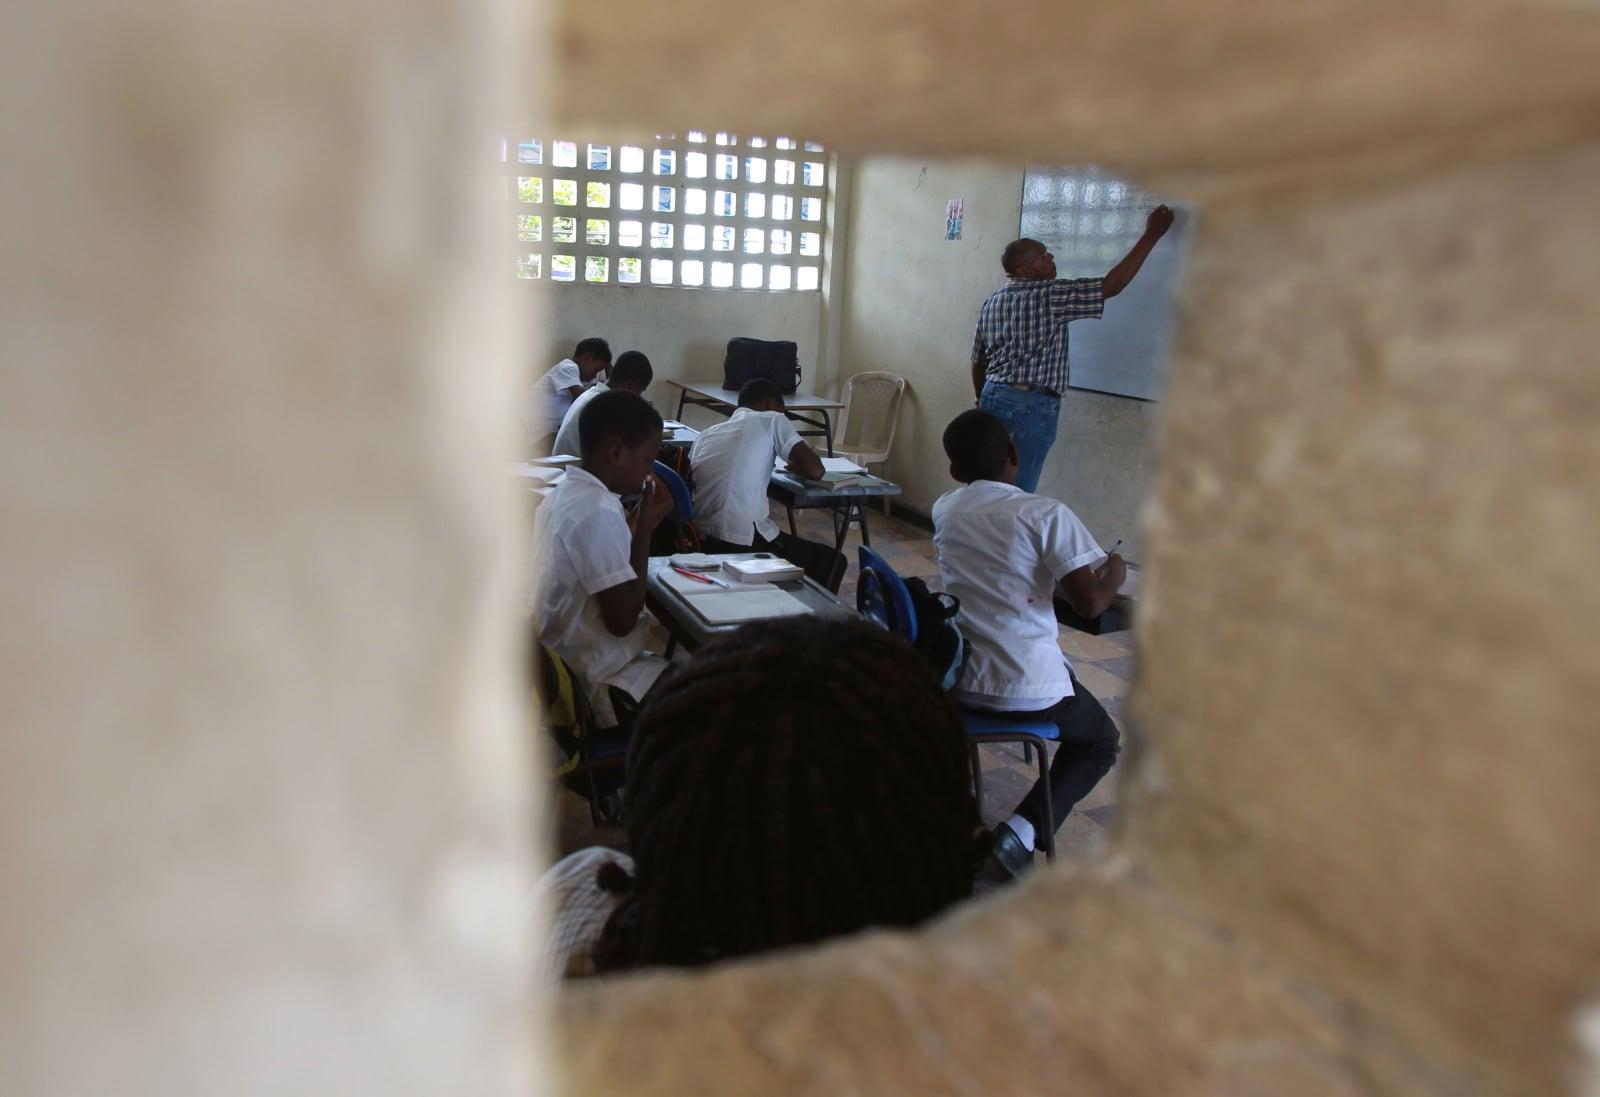 Szkoła w Kolumbii fot. EPA/Ernesto Guzmán